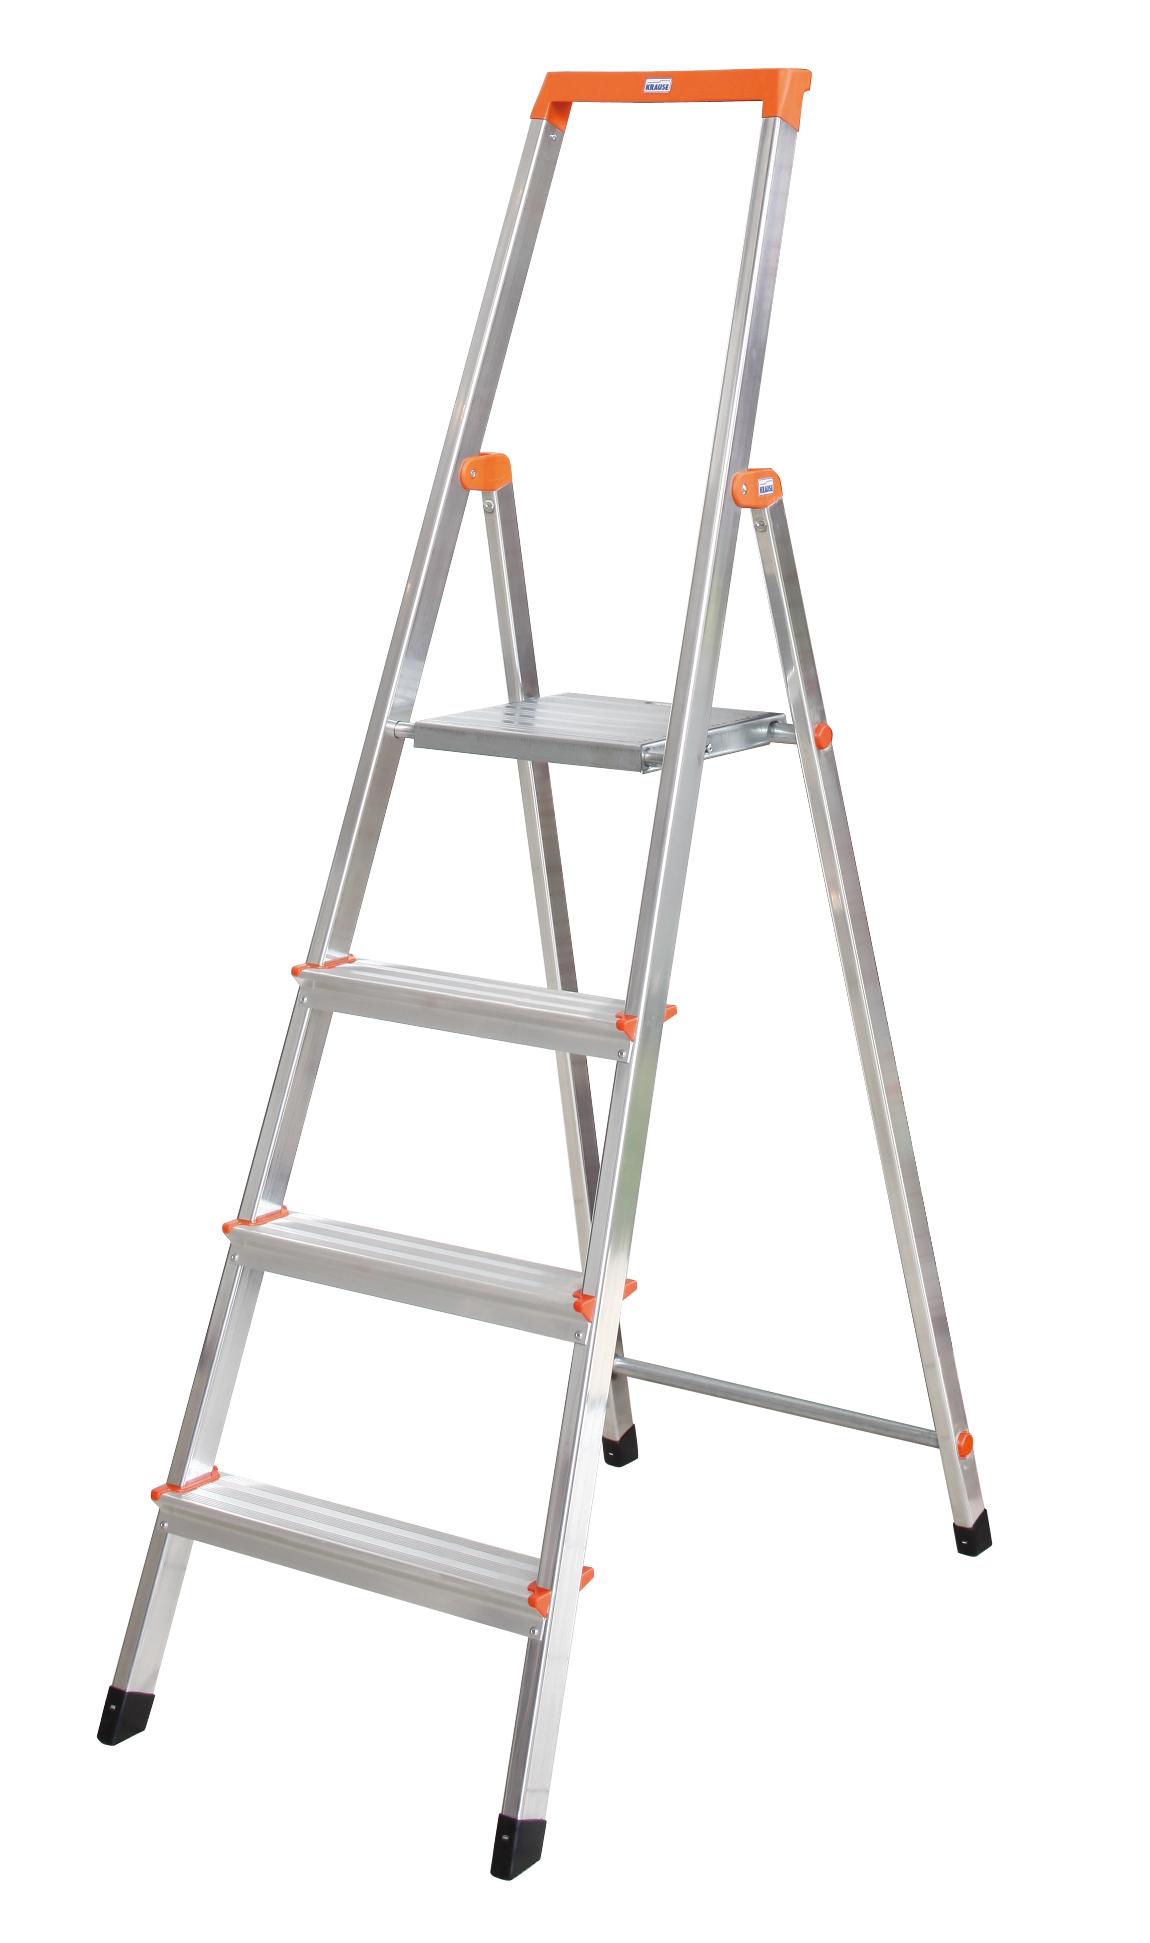 ROLLY Лестница двусторонняя складная, ступенек 2 х 2, алюм